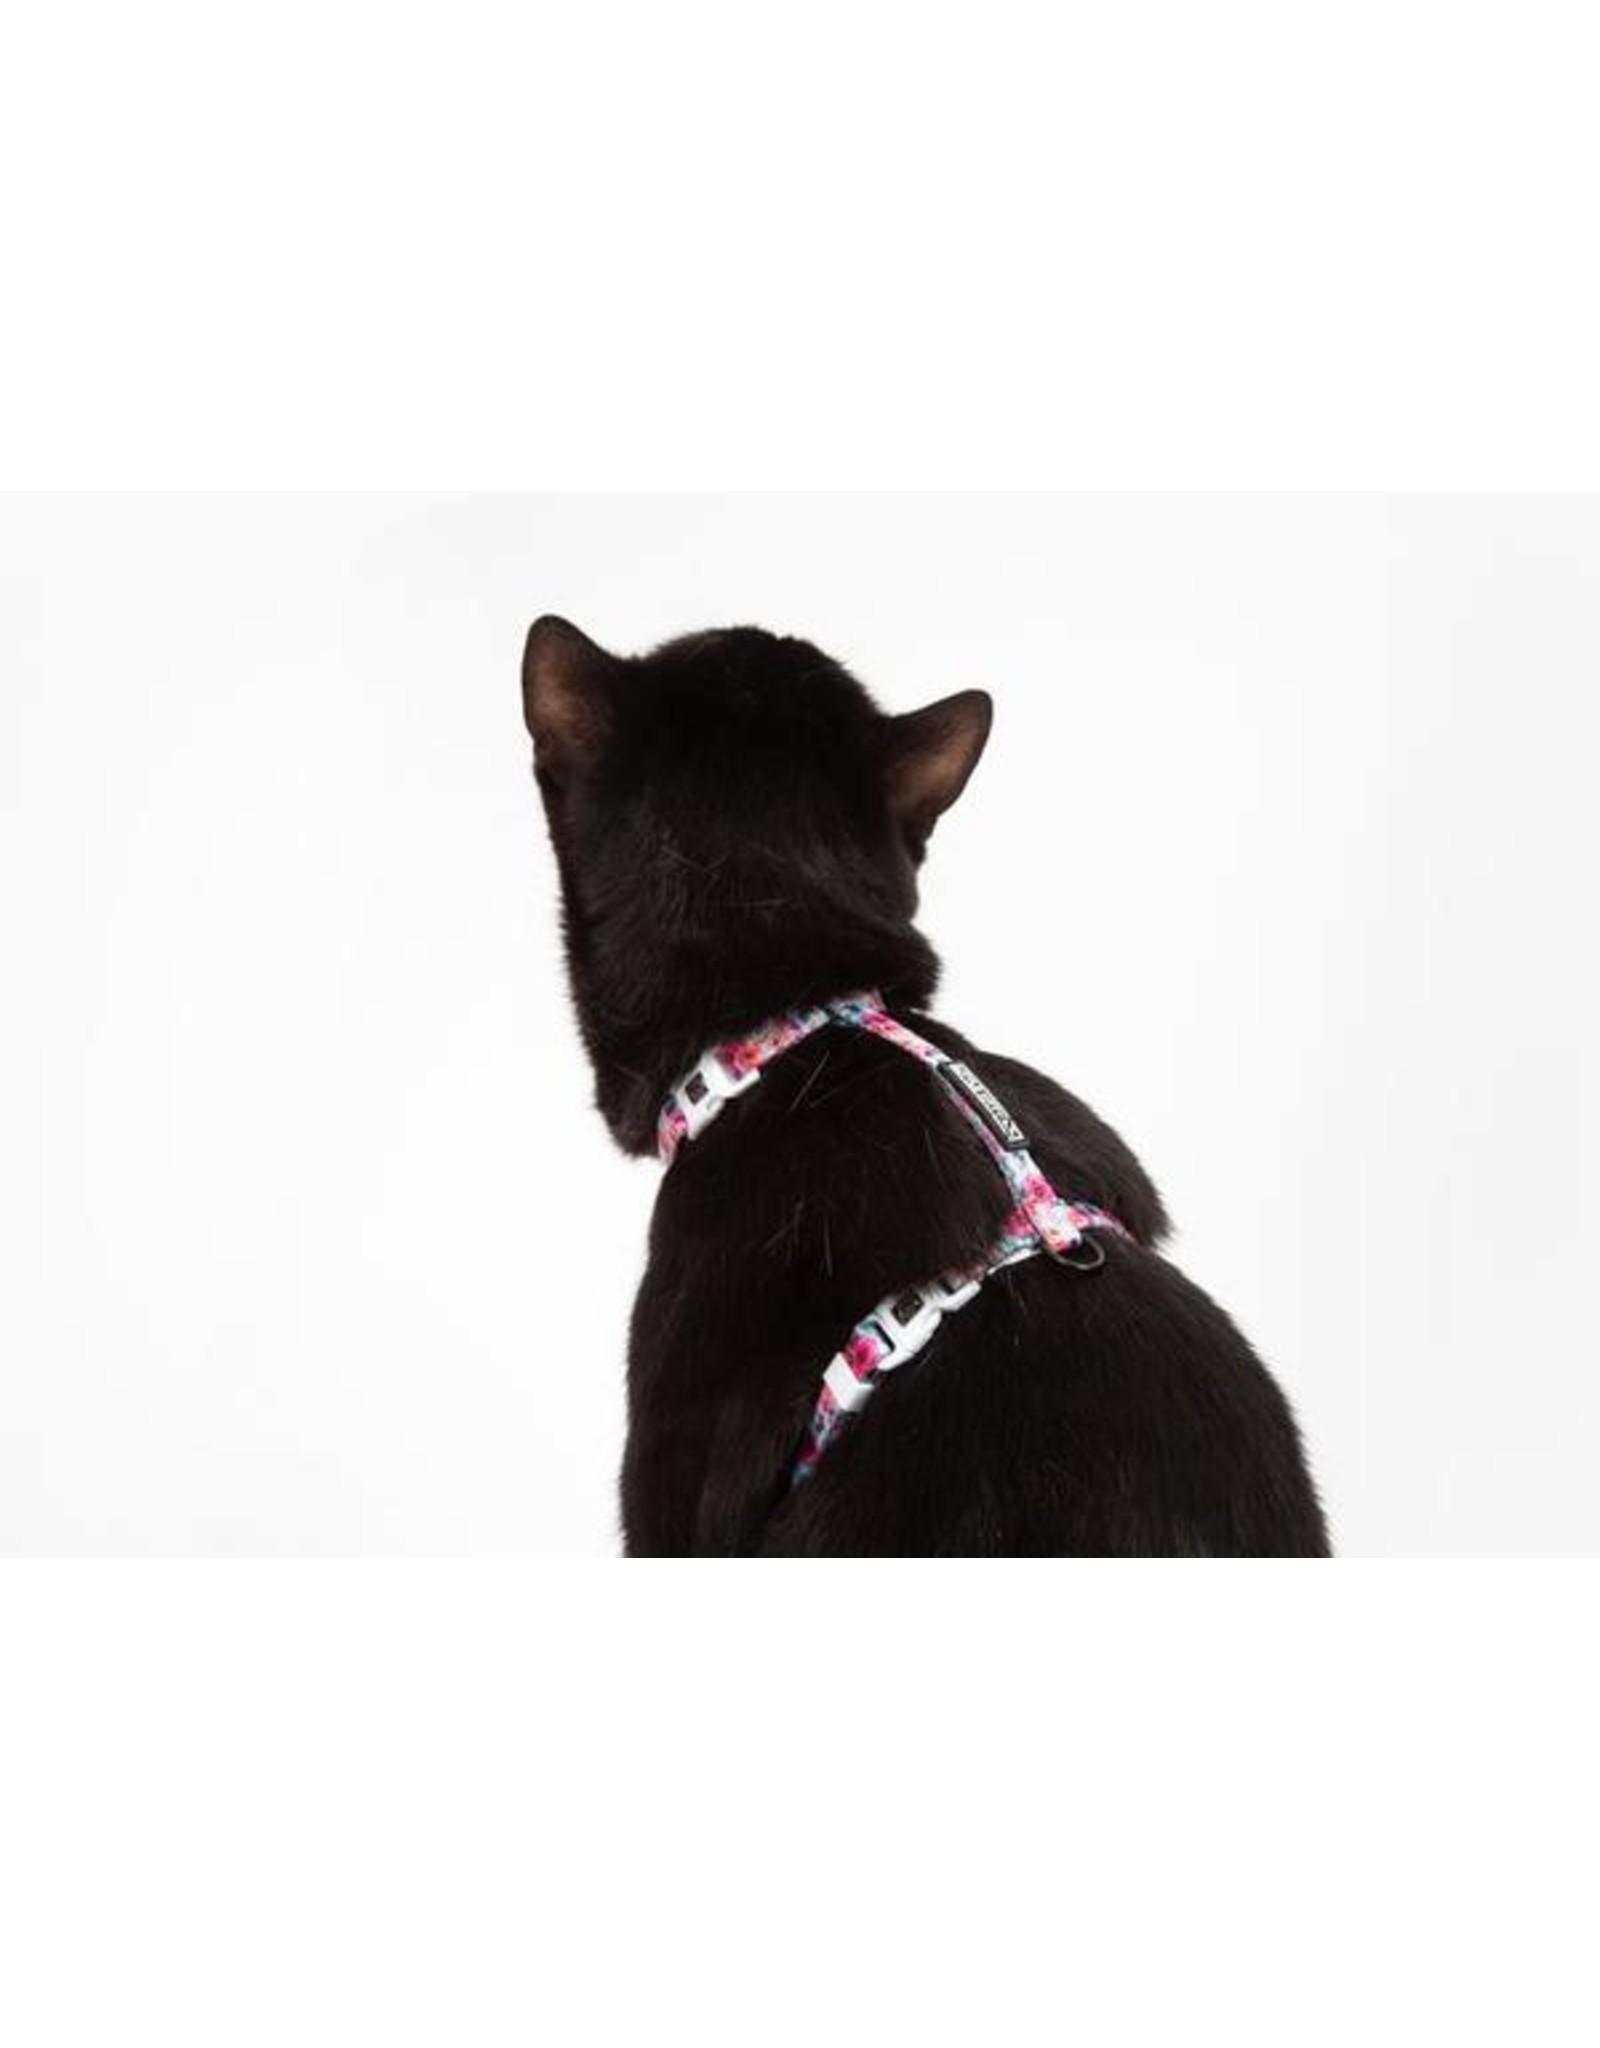 Little Kitty Little Kitty Strap Harness That Floral Feeling